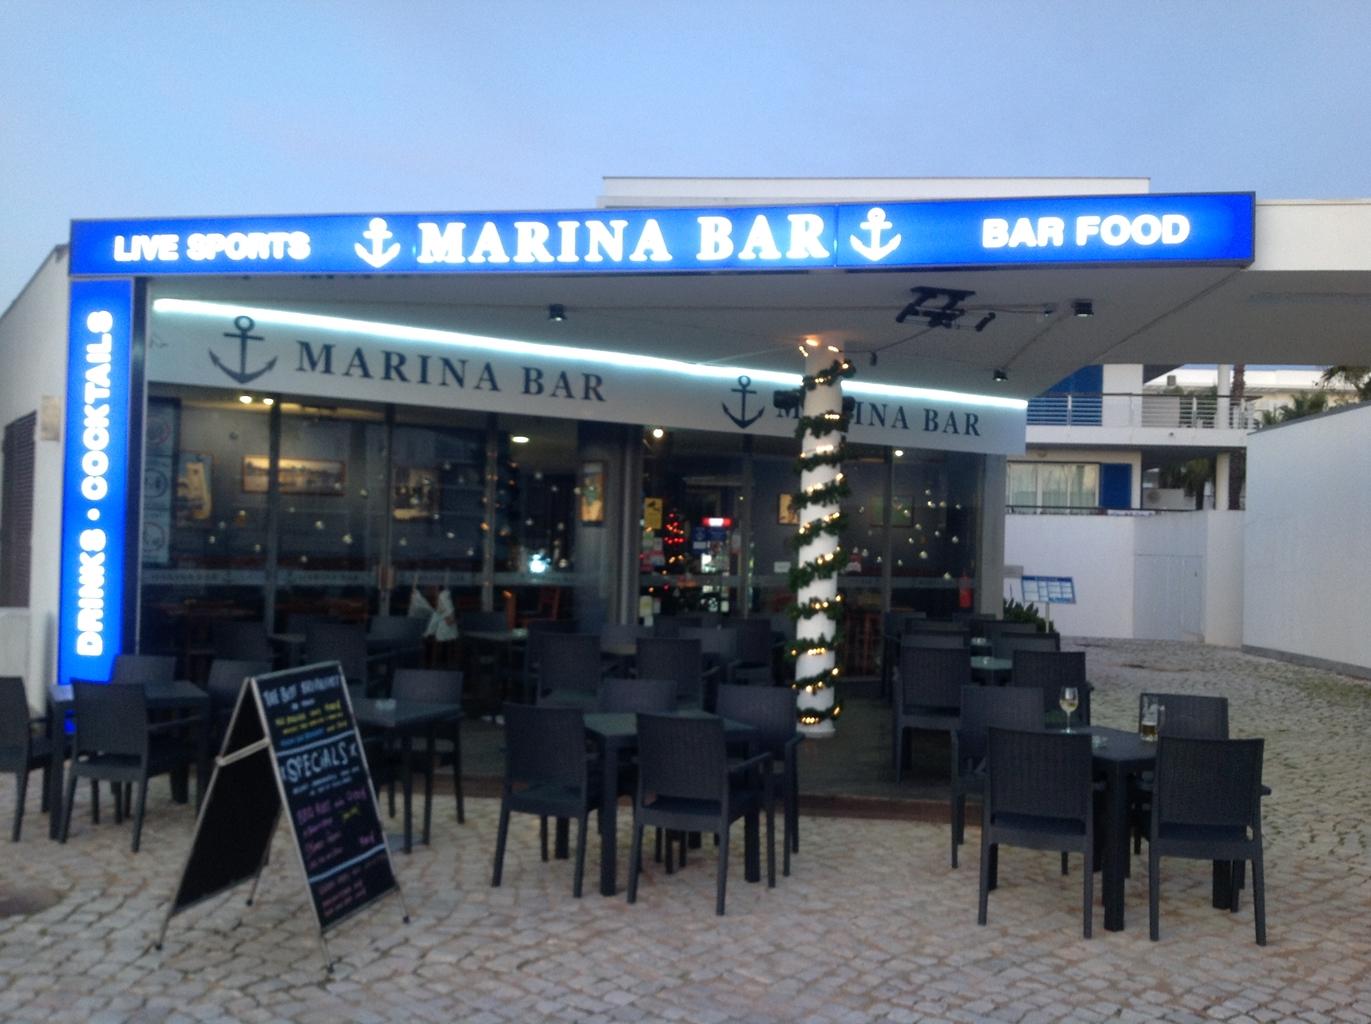 Marina Bar Lagos Bar in Lagos Portugal Christmas Lagos Algarve 1 - Sports Bar Lagos and Restaurant Bar Lagos Algarve portugal